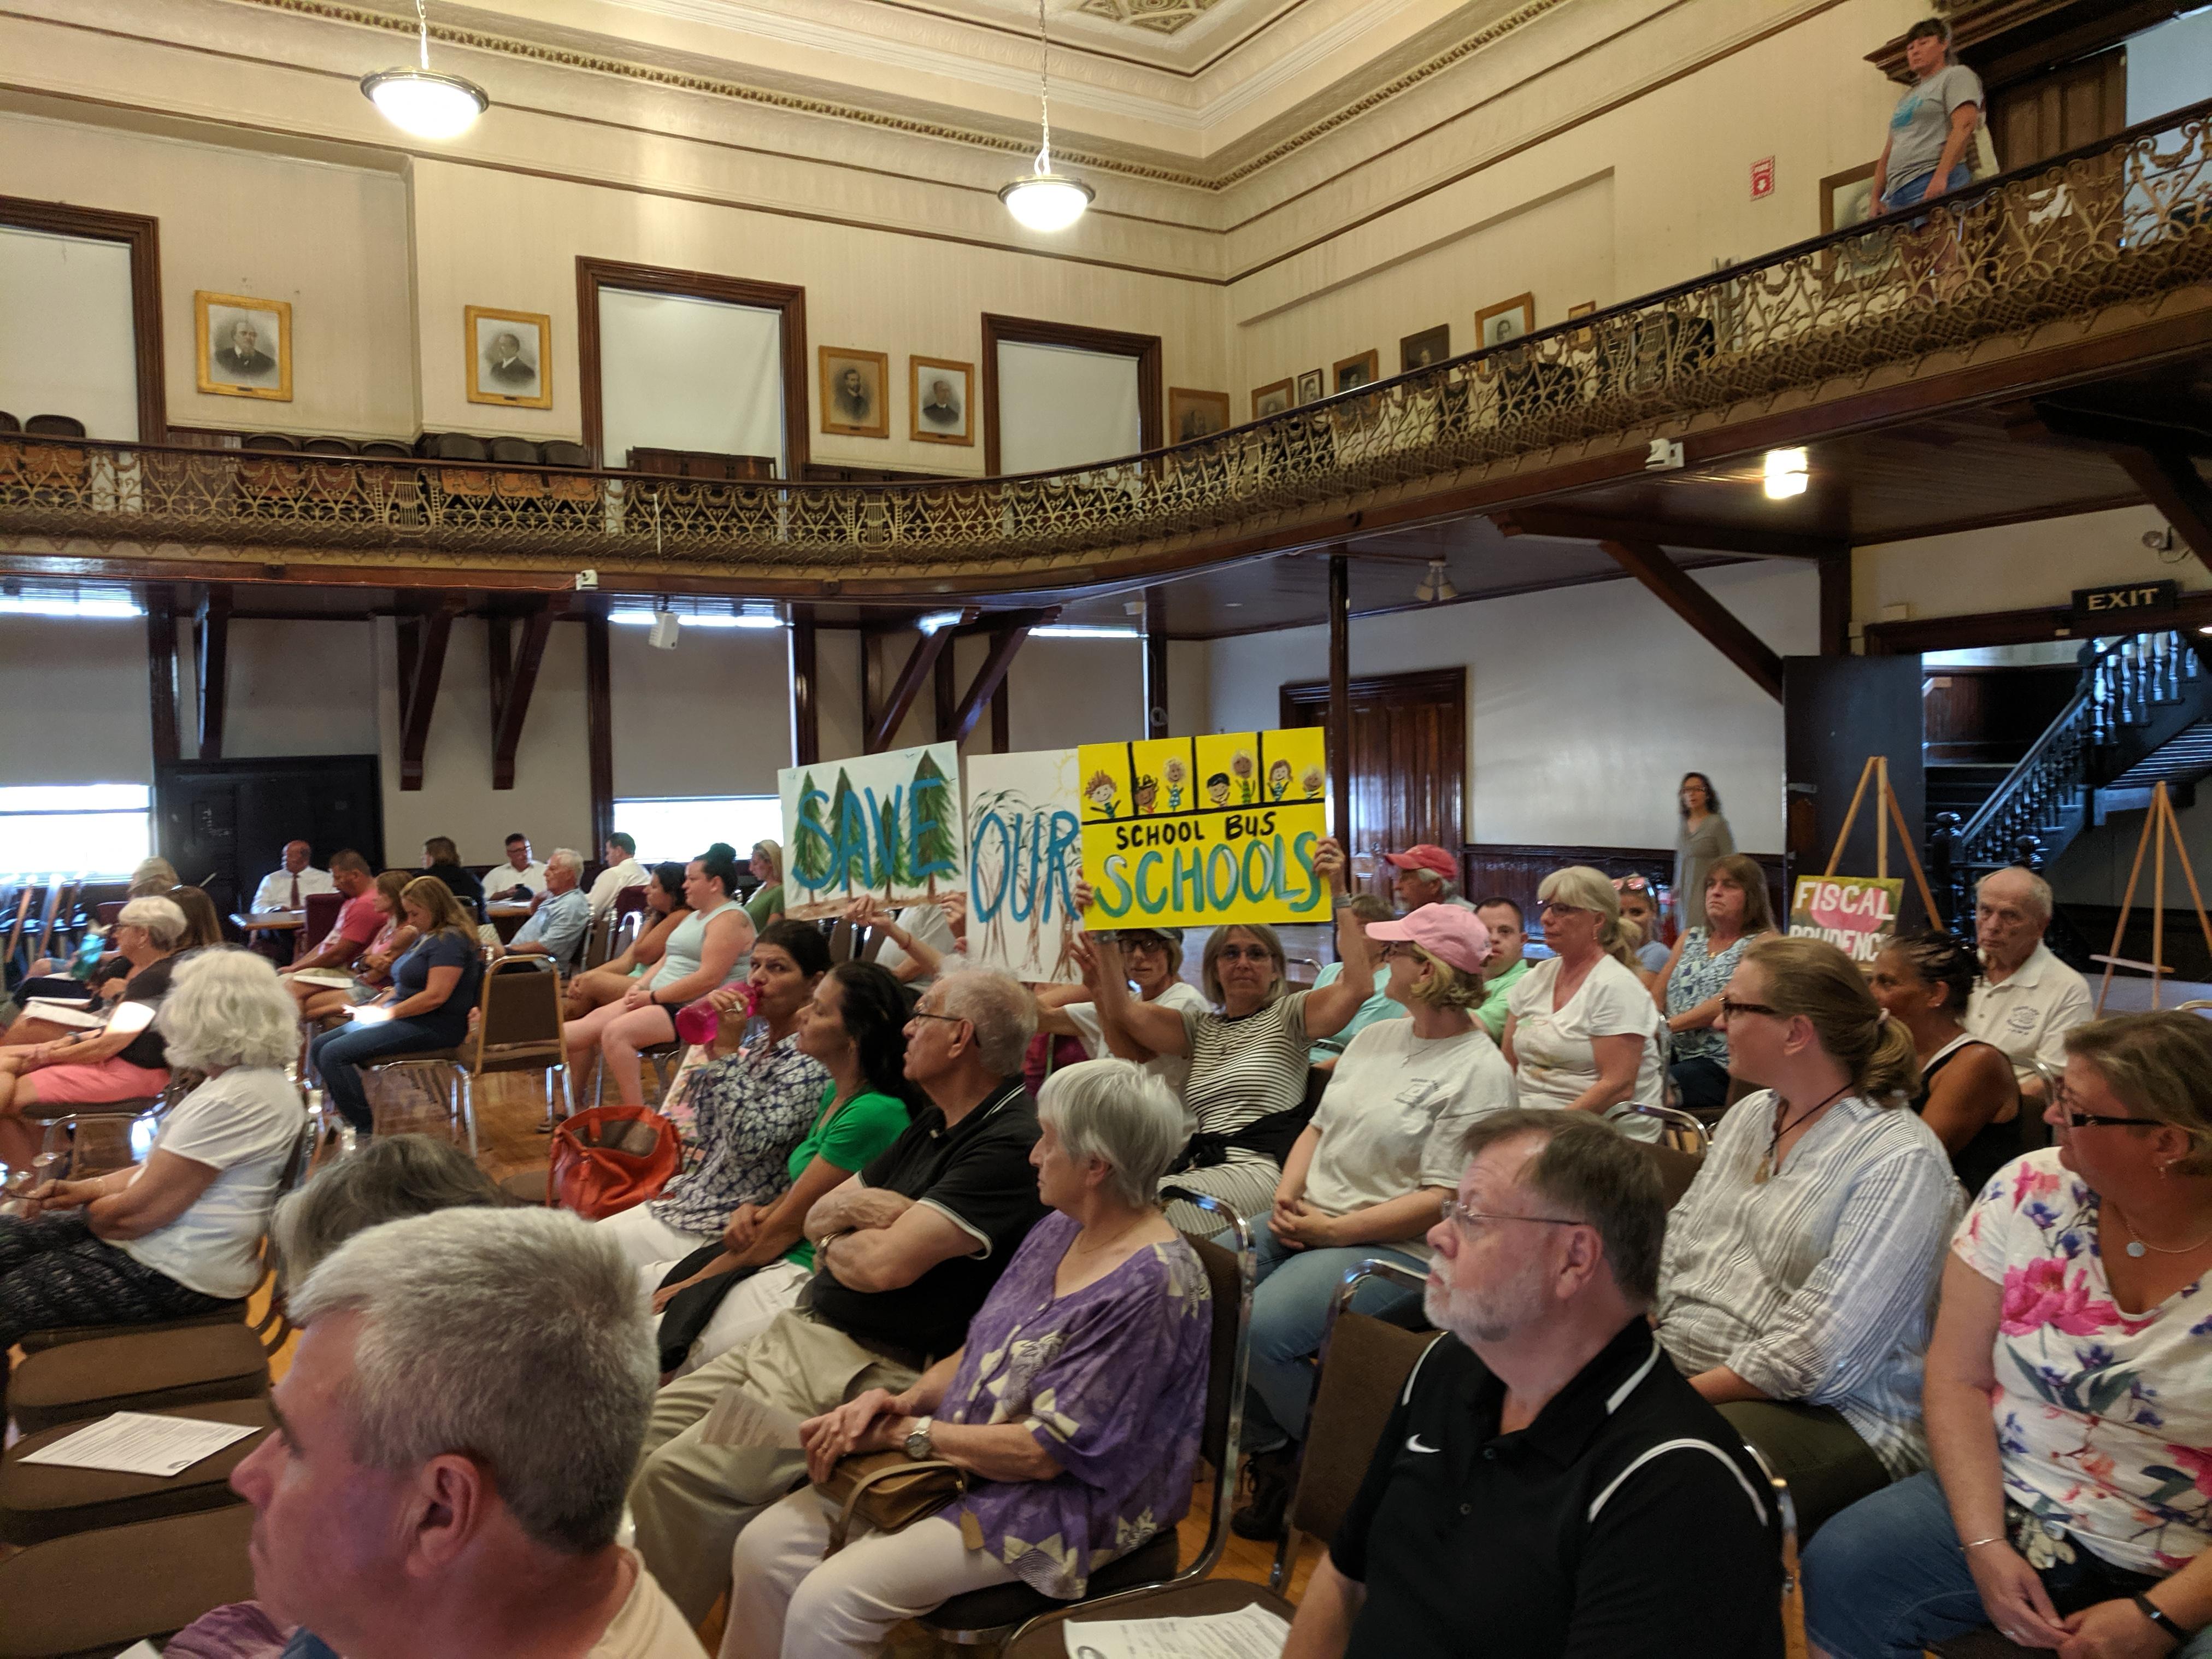 School Committee Dore & Whittier presentation to full City Council July 9 2019 City Hall Kyrouz Auditorium Gloucester MA ©c ryan (6)